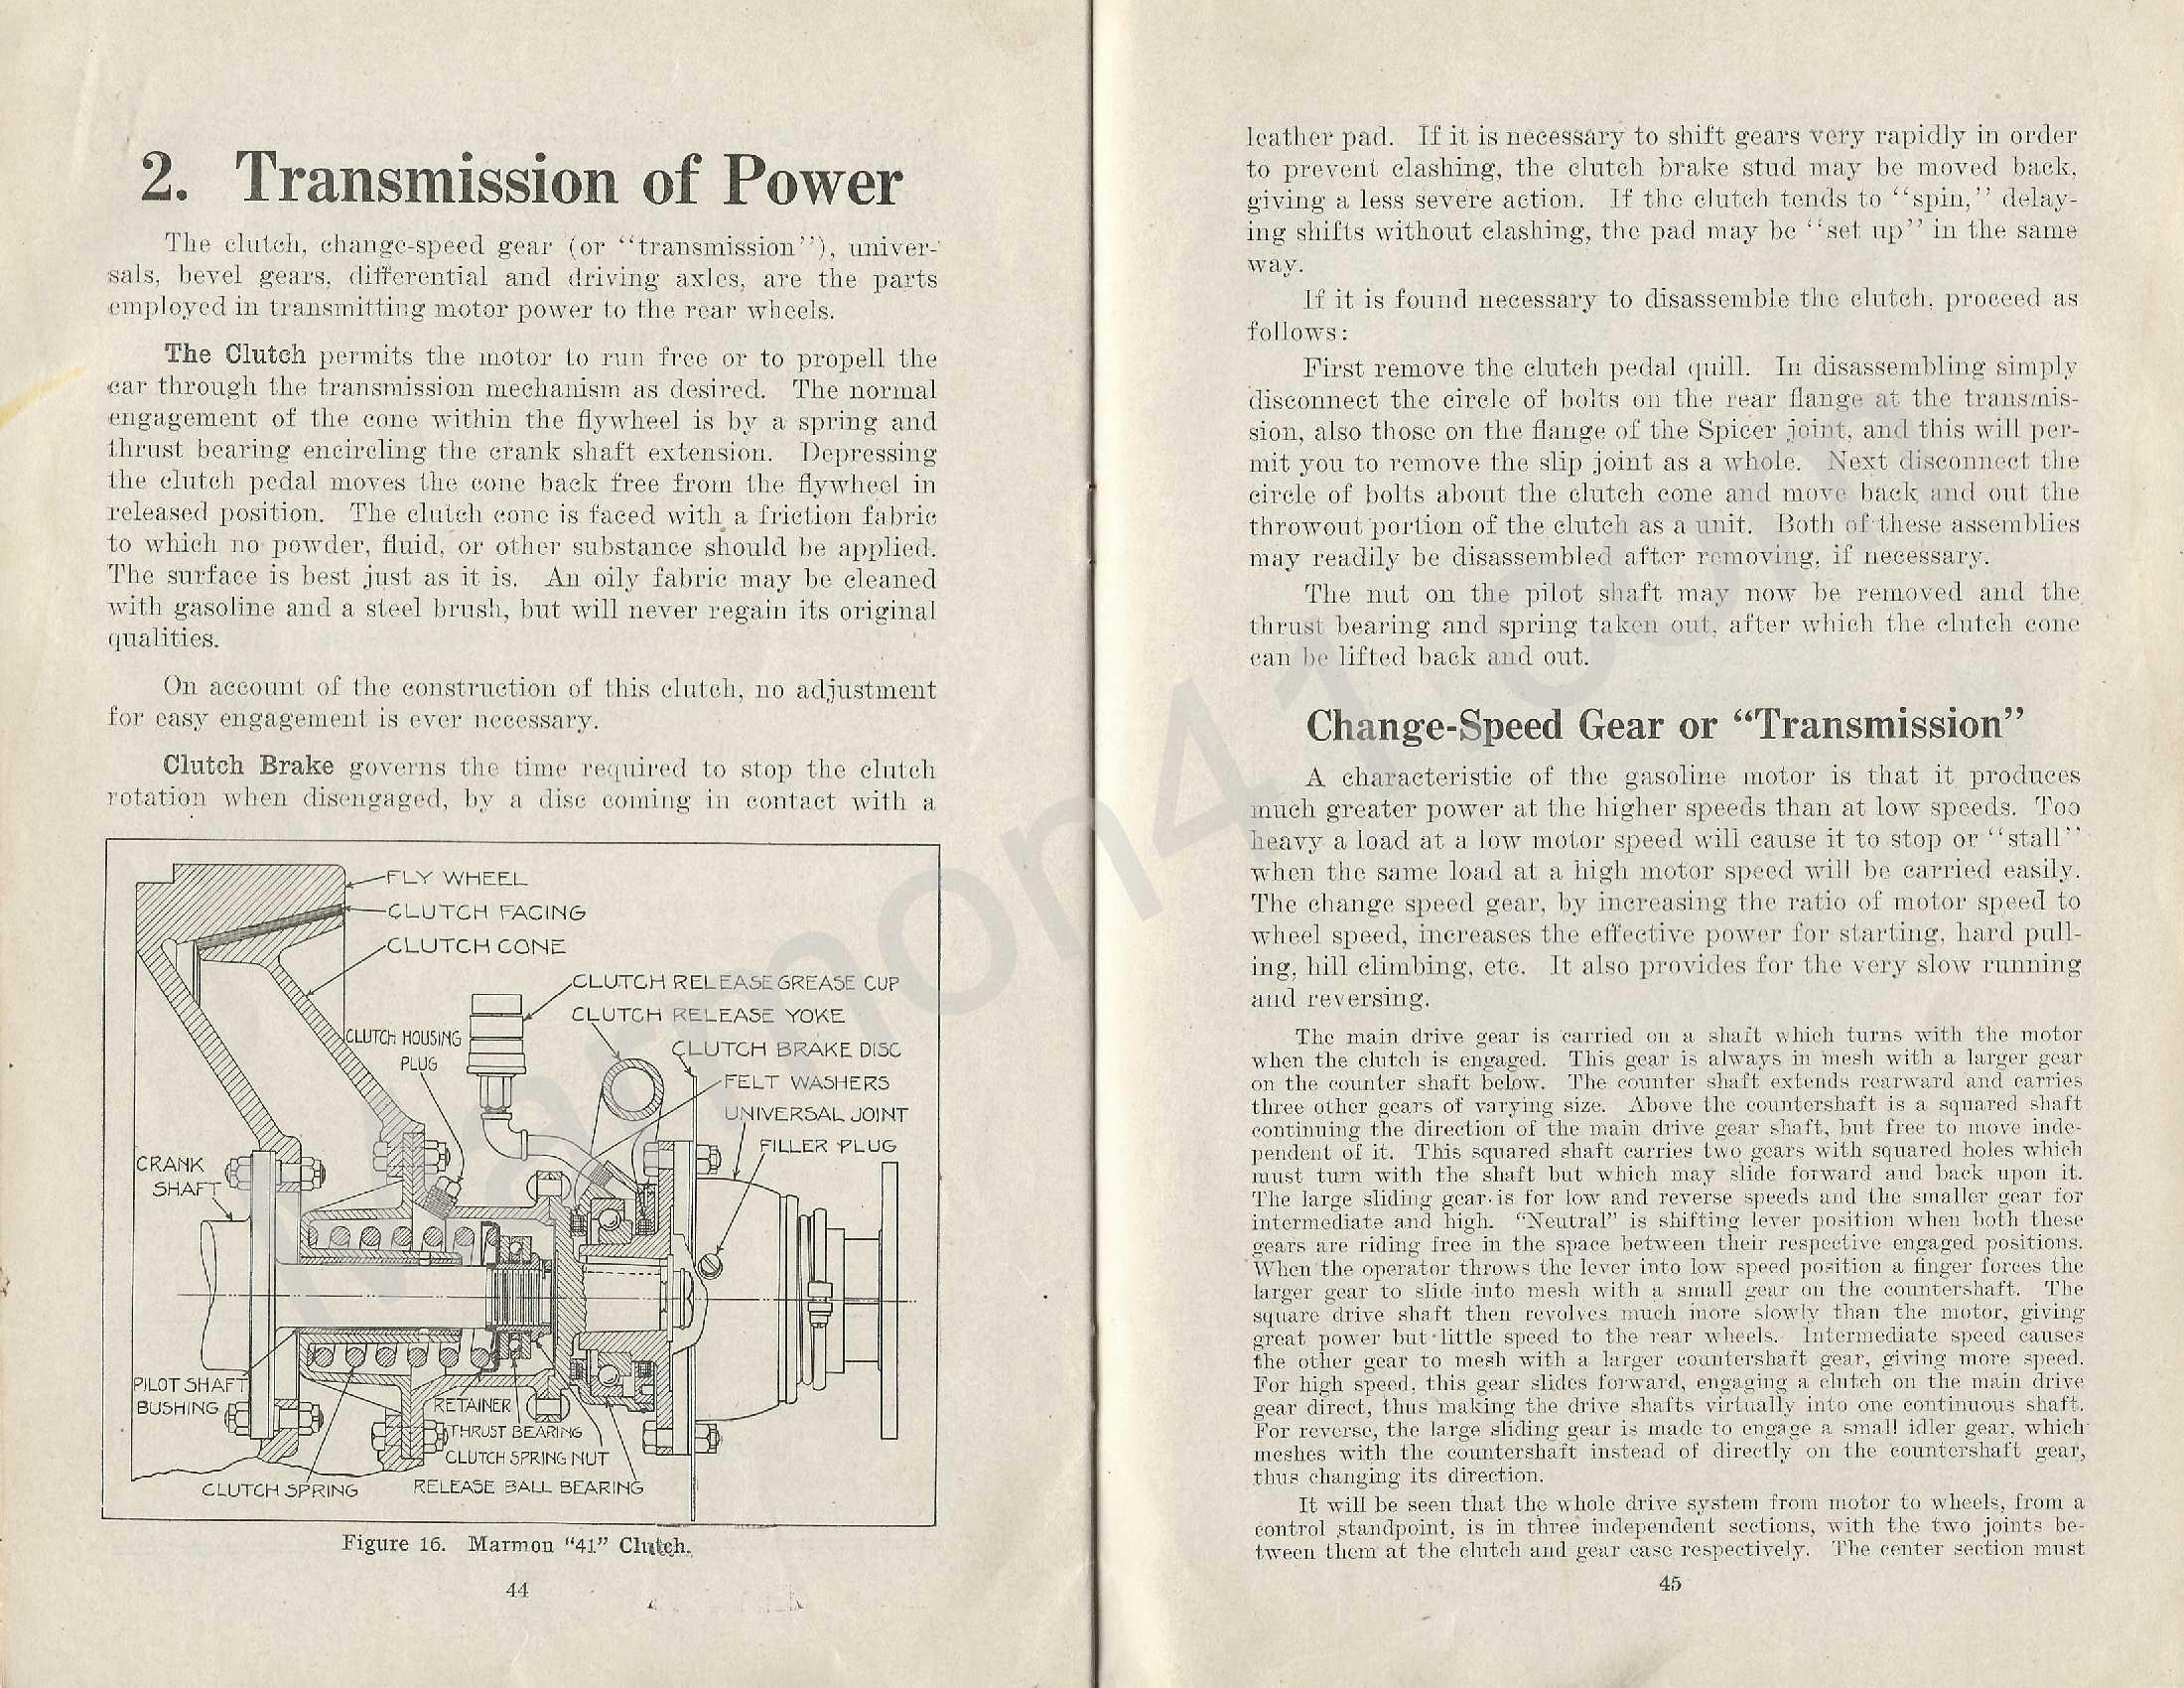 1915-07-01_Marmon41_Info_Book_1534-B_24